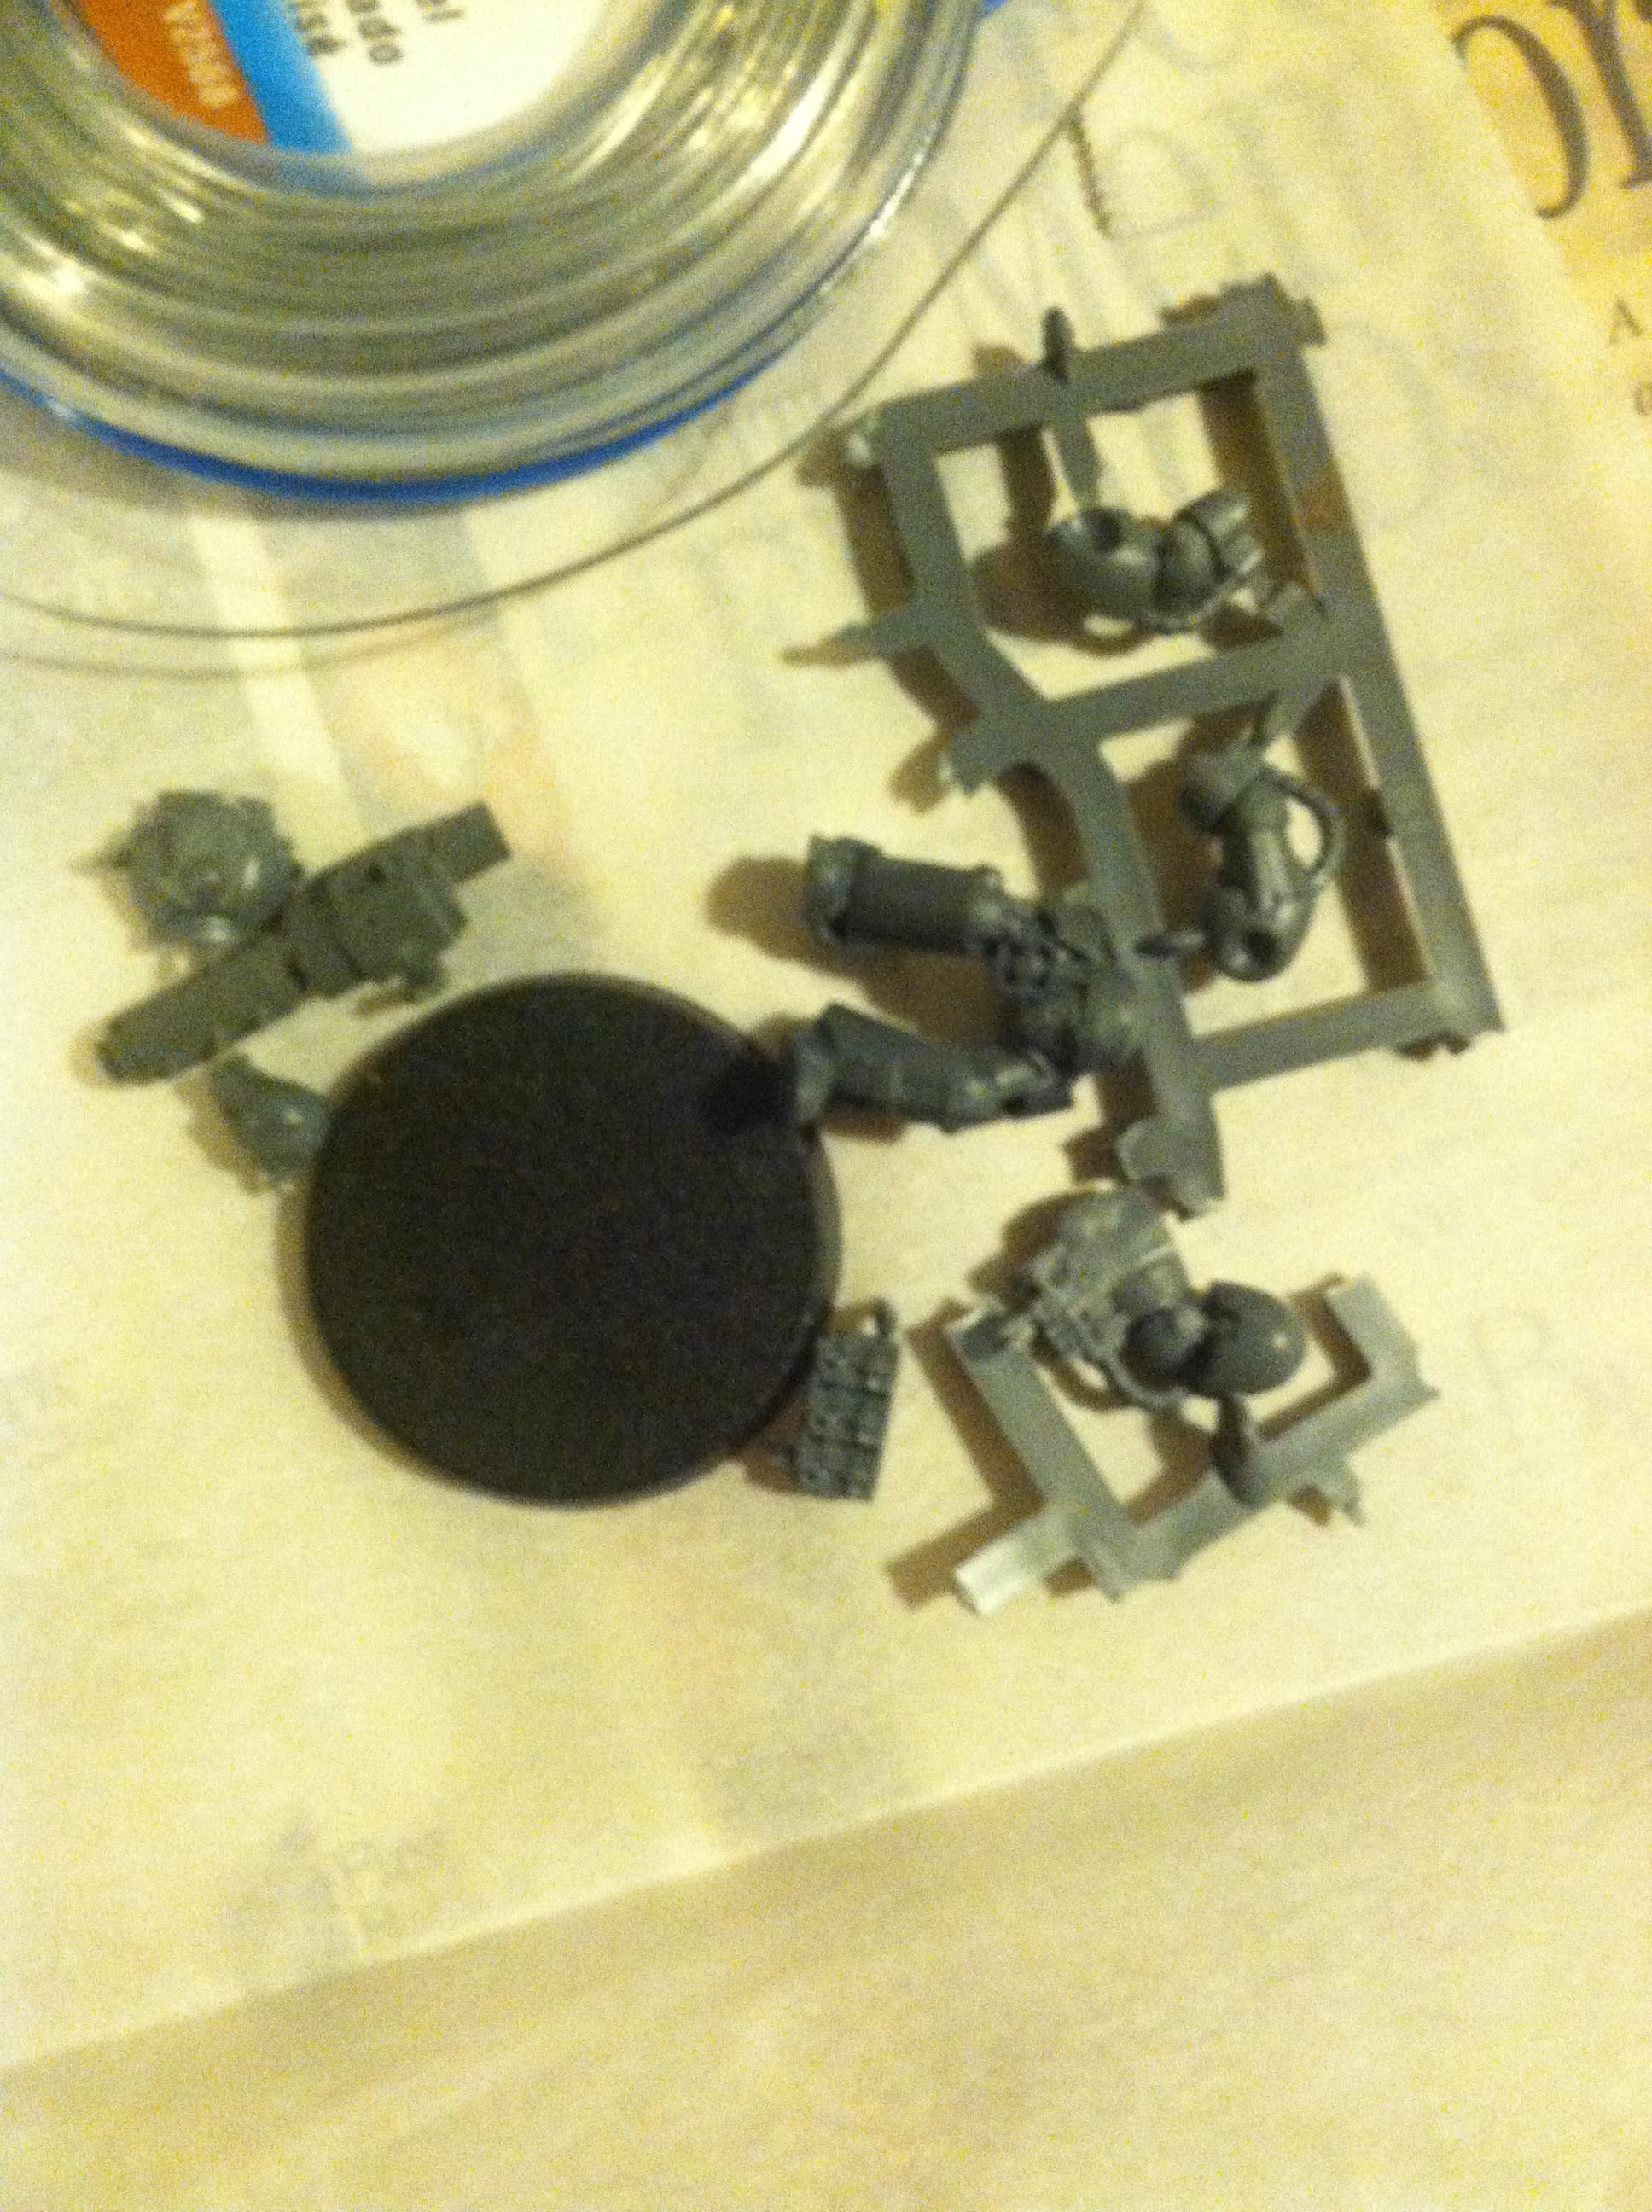 Mantis Maker, Snipers, Terminator Armor, Work In Progress